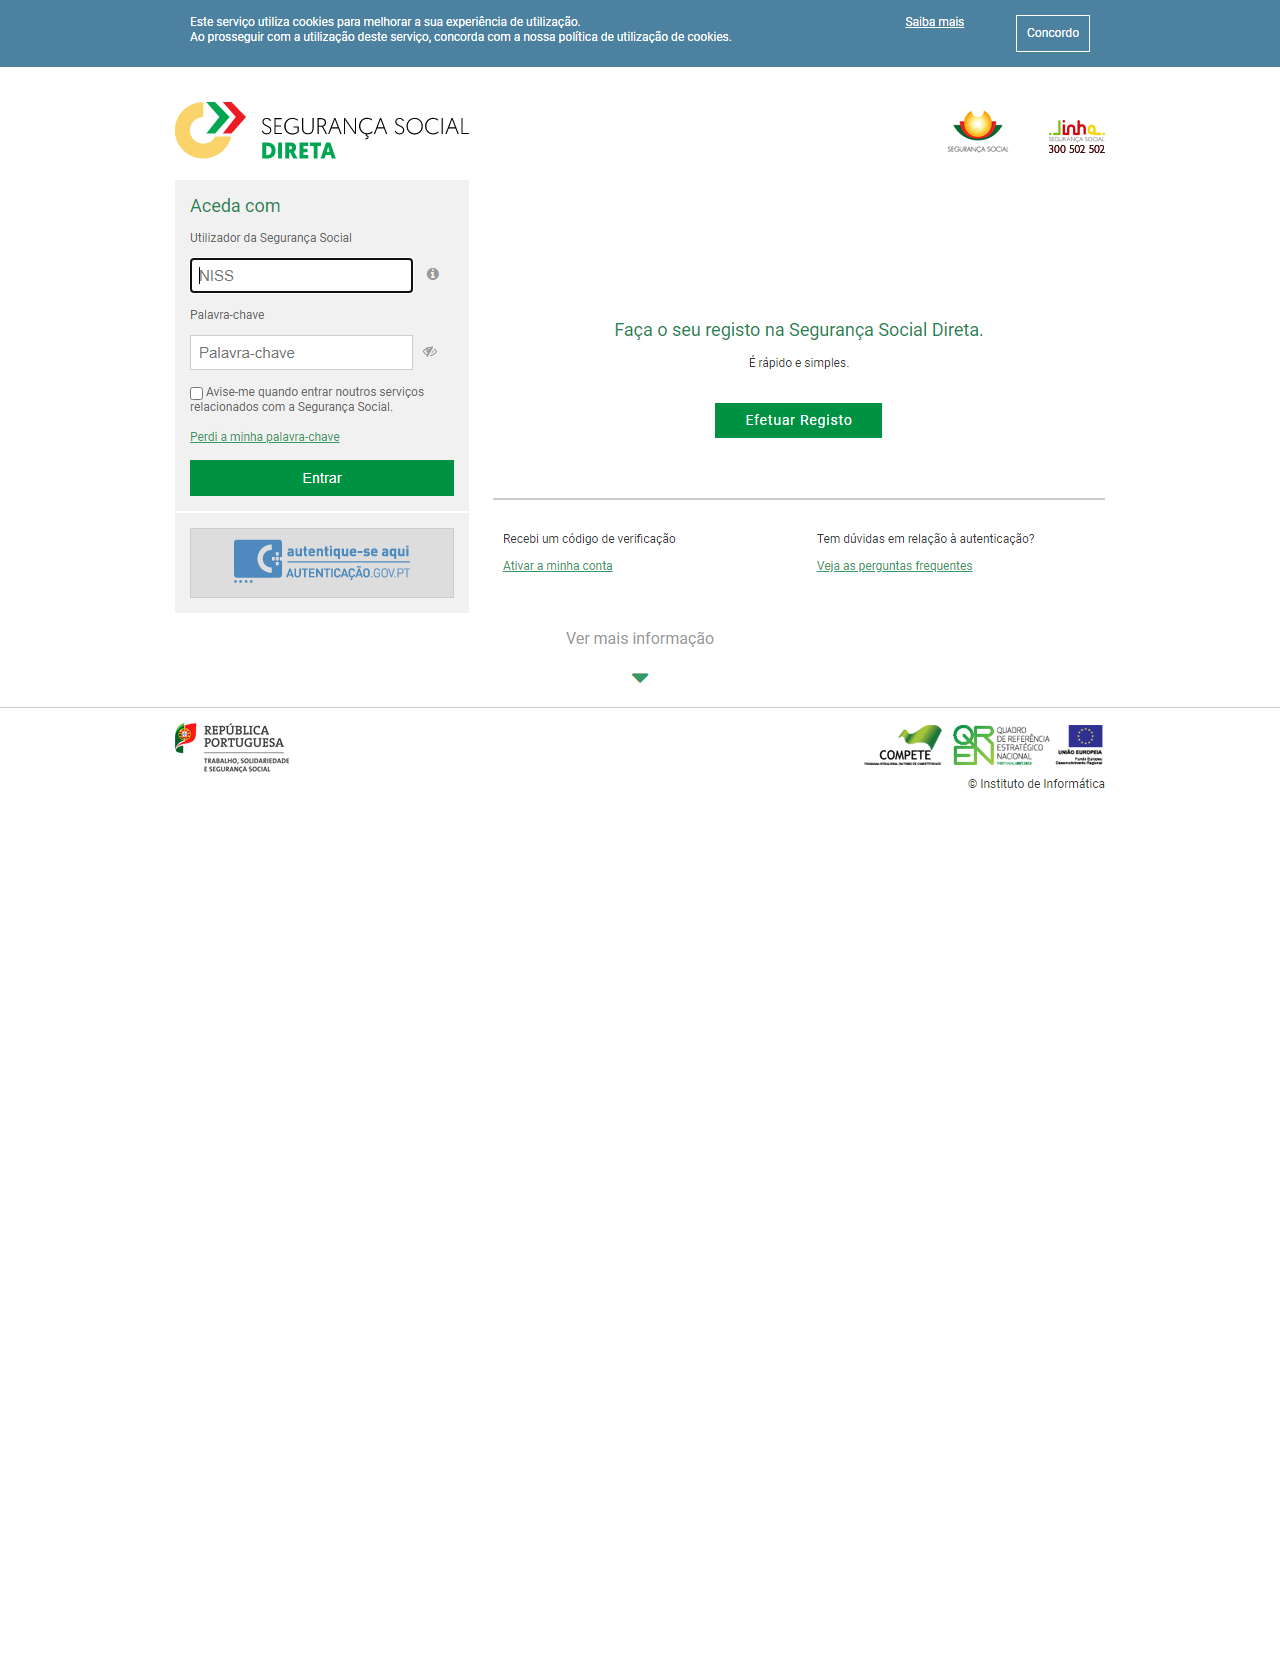 Screenshot Desktop - https://app.seg-social.pt/sso/login?service=https%3A%2F%2Fapp.seg-social.pt%2Fptss%2Fcaslogin